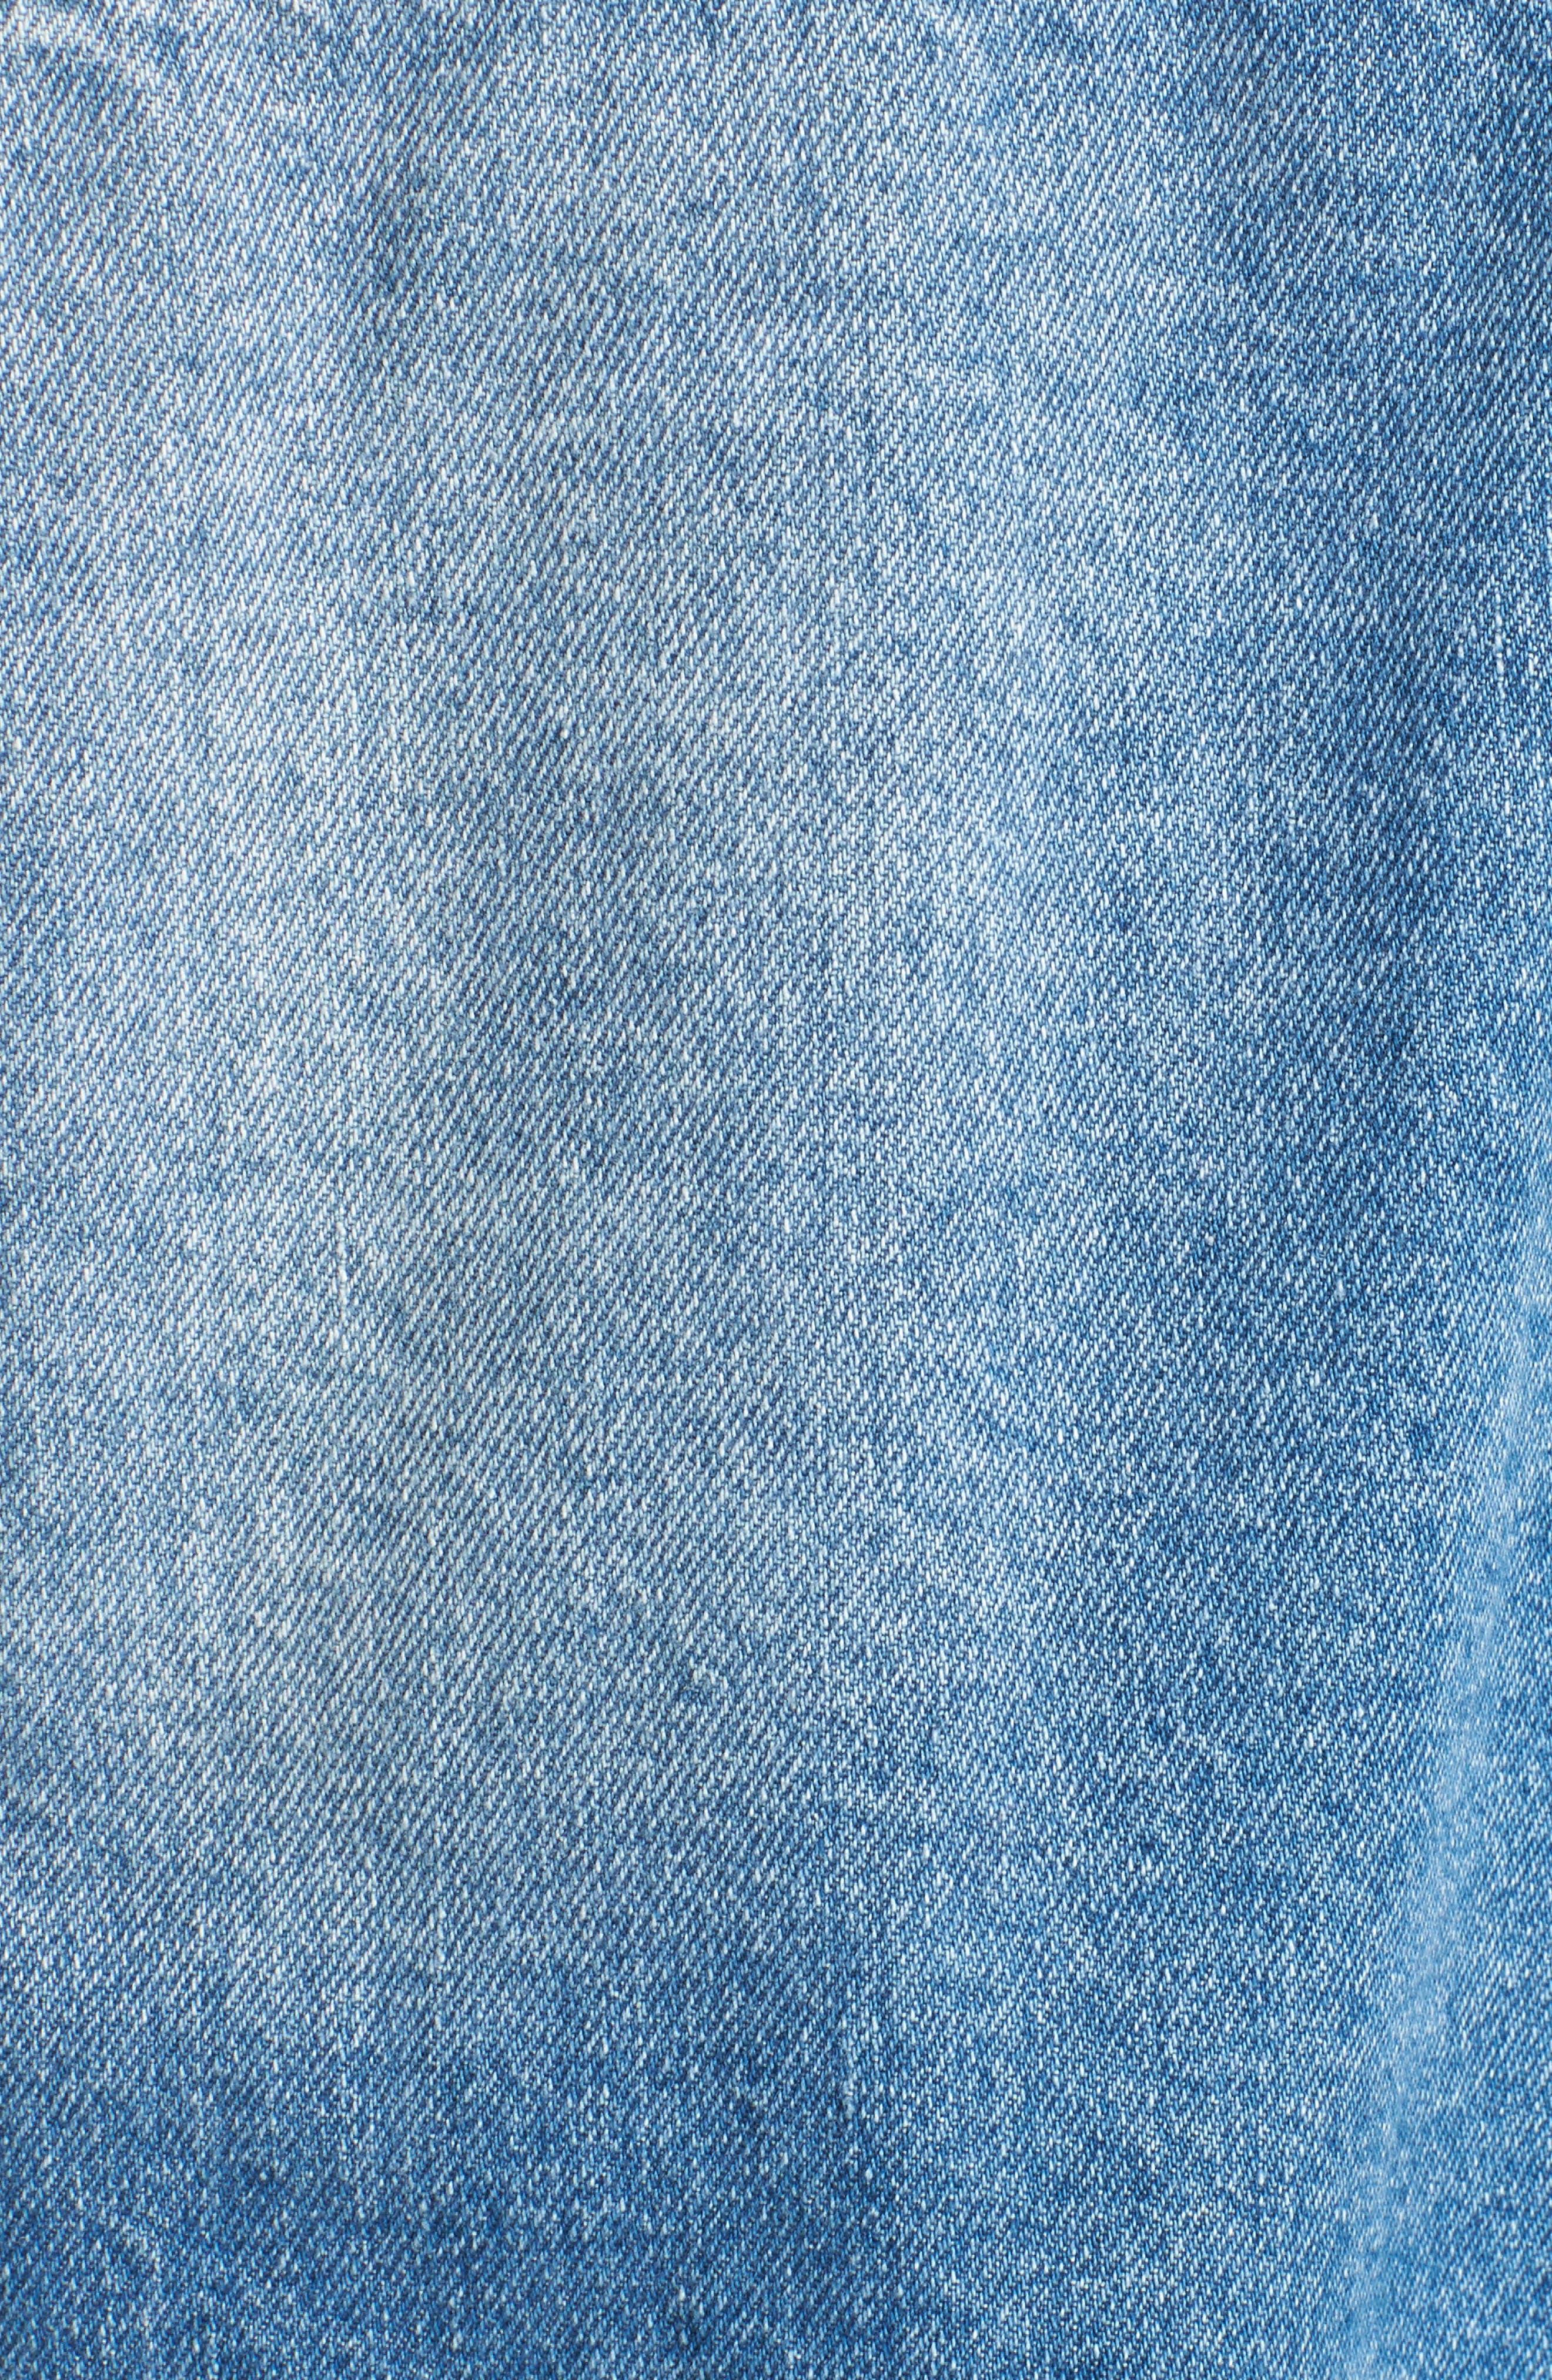 Alternate Image 5  - Elodie Decon Longline Denim Jacket